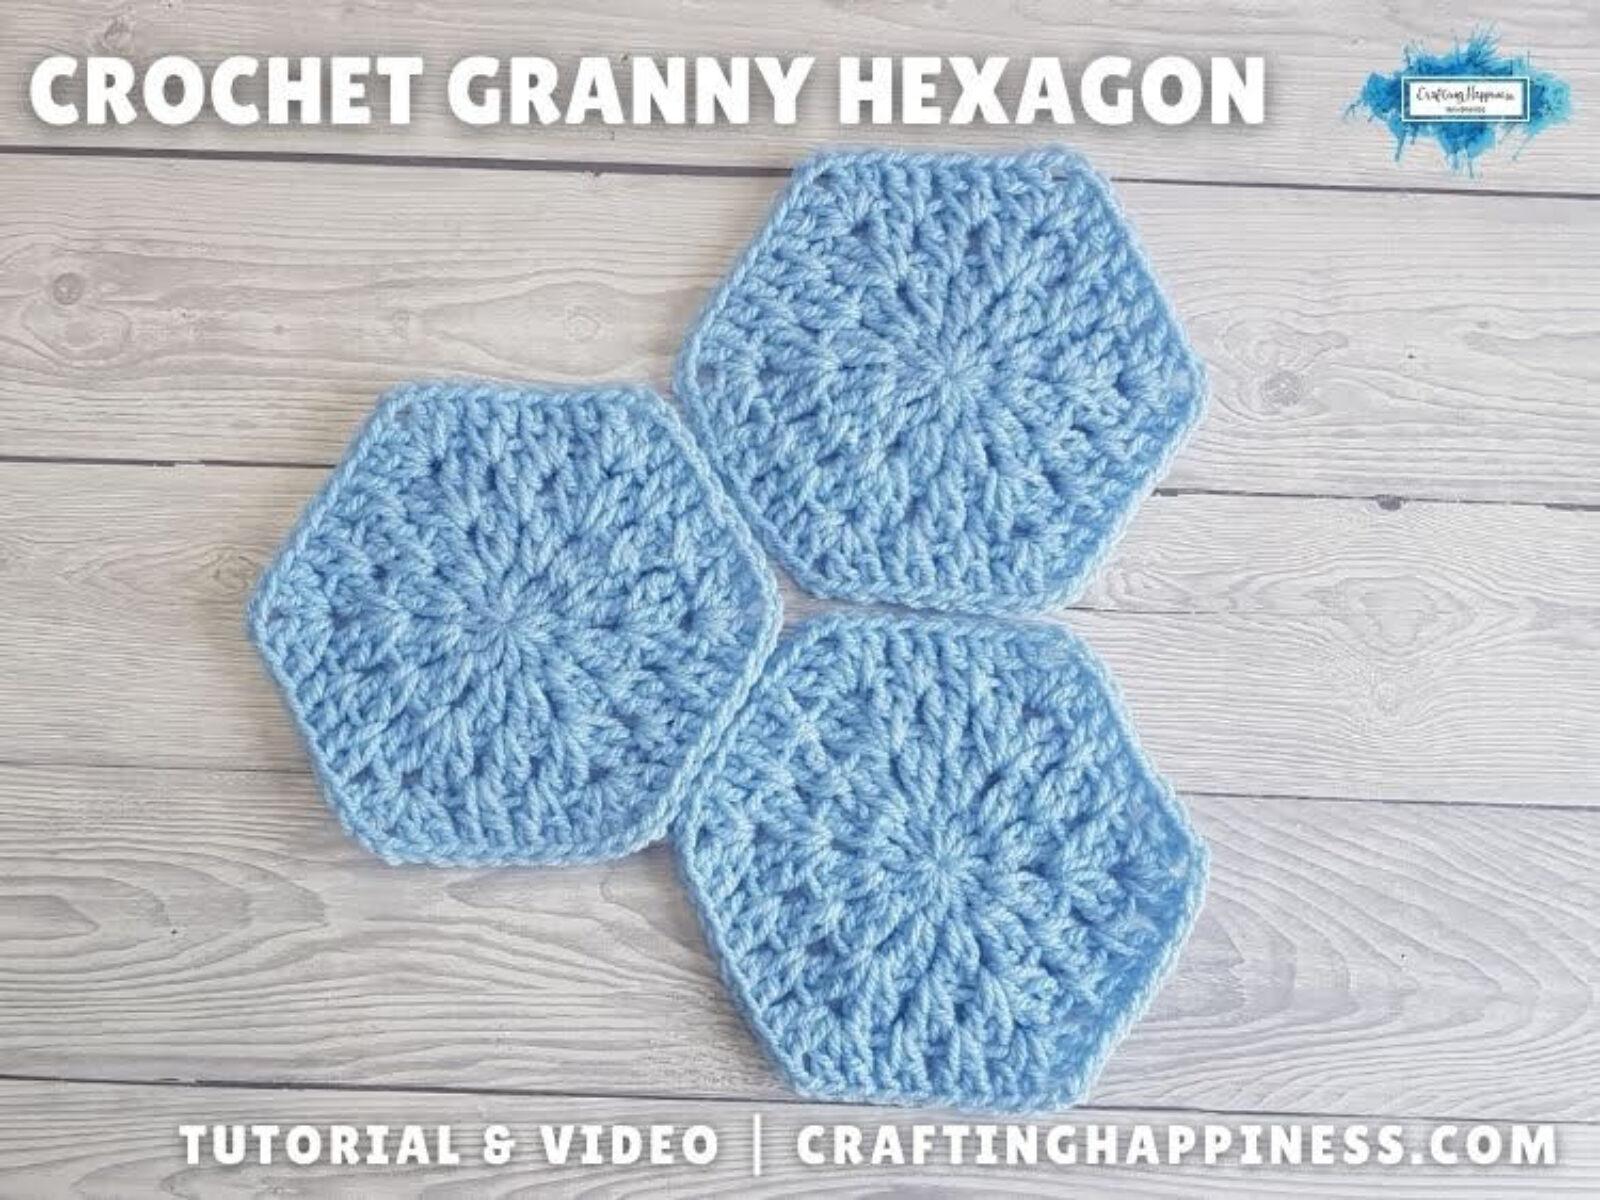 FB BLOG POSTER - Crochet Granny Hexagon Crafting Happiness